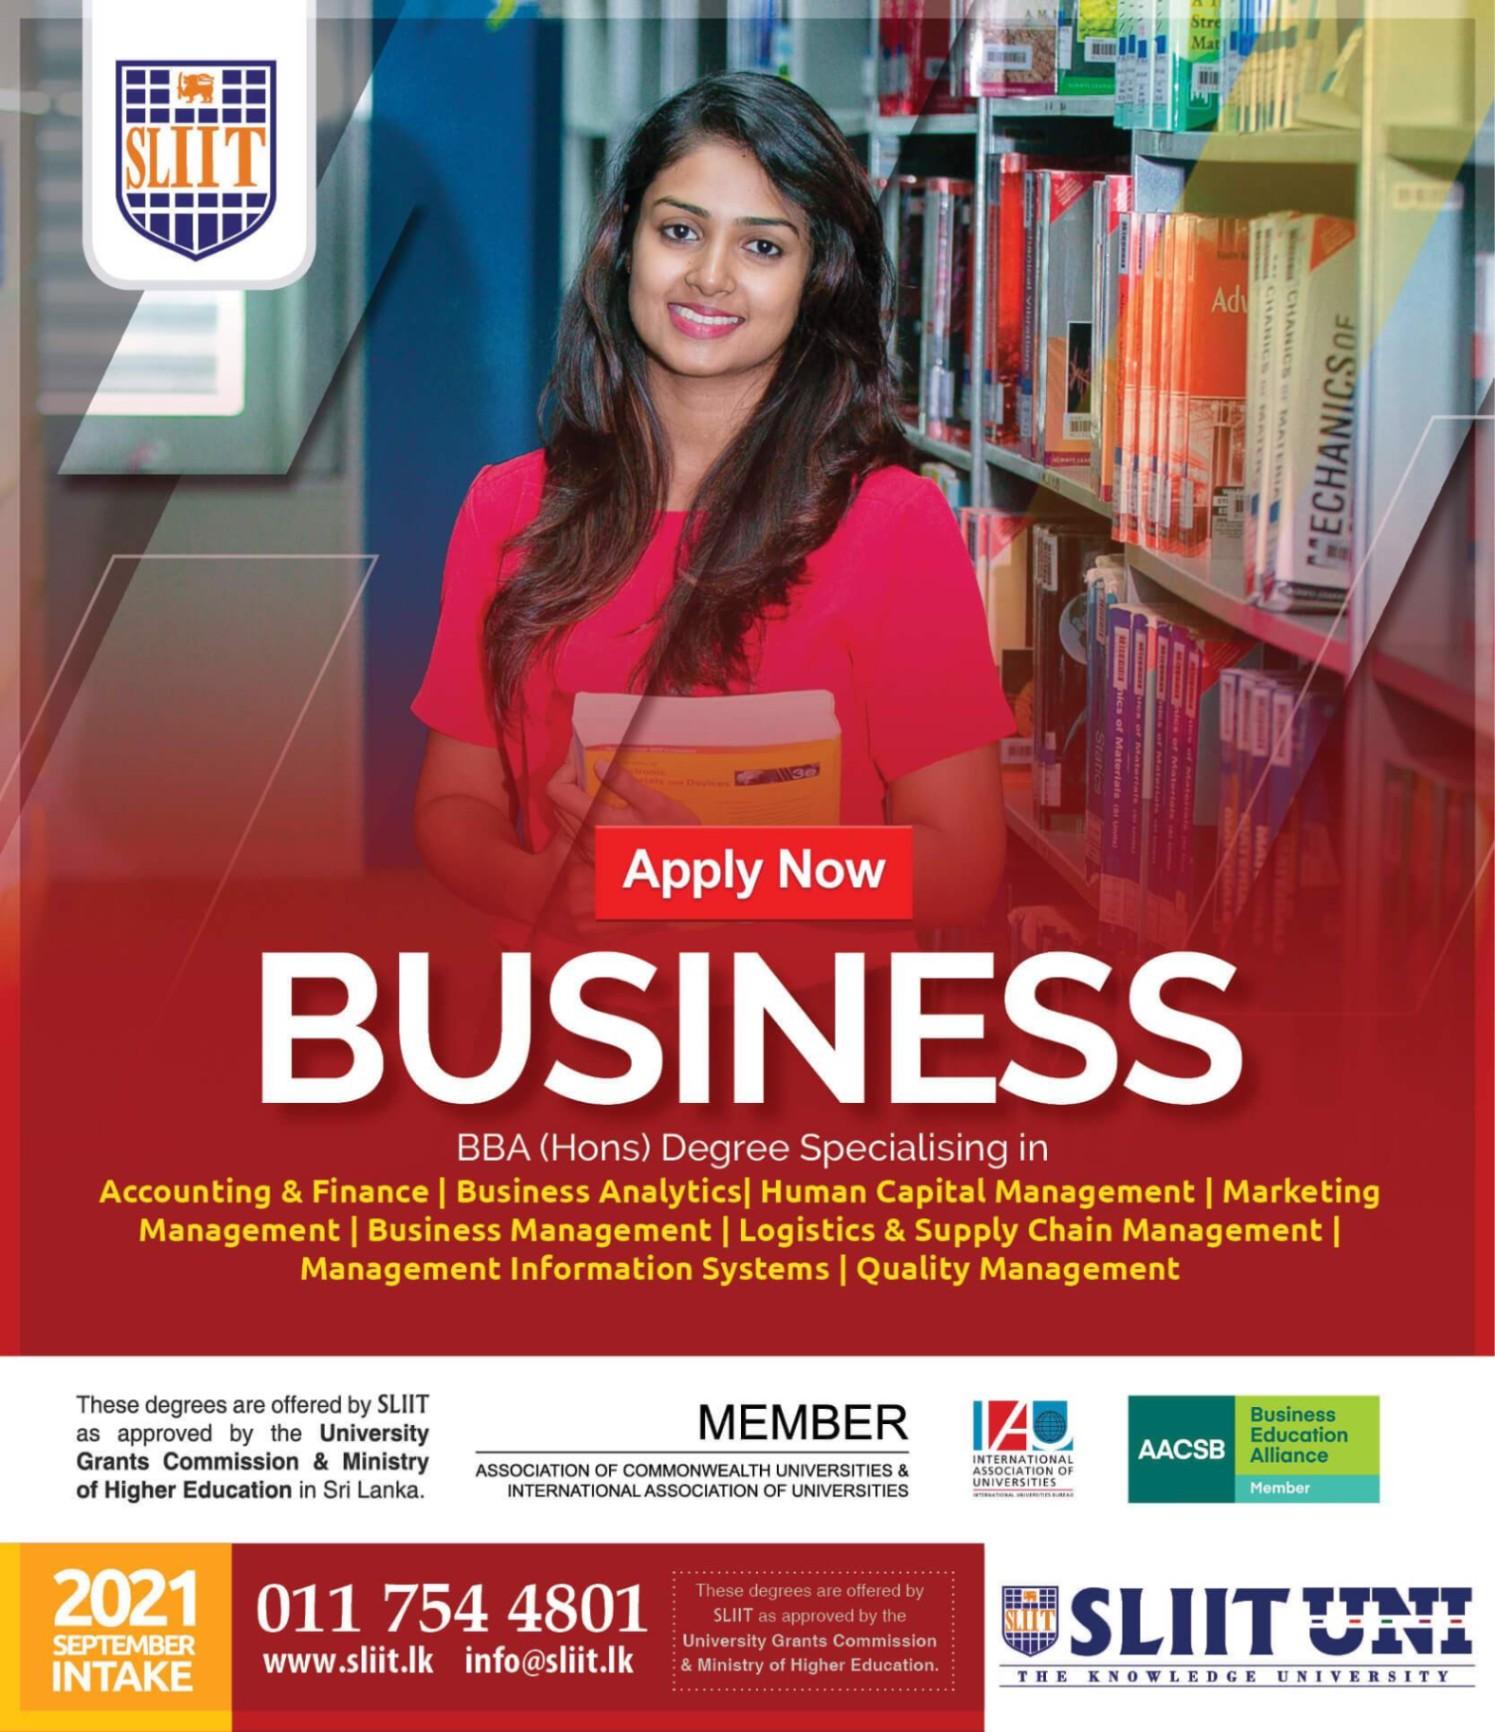 SLIIT Business Management Degree Programmes